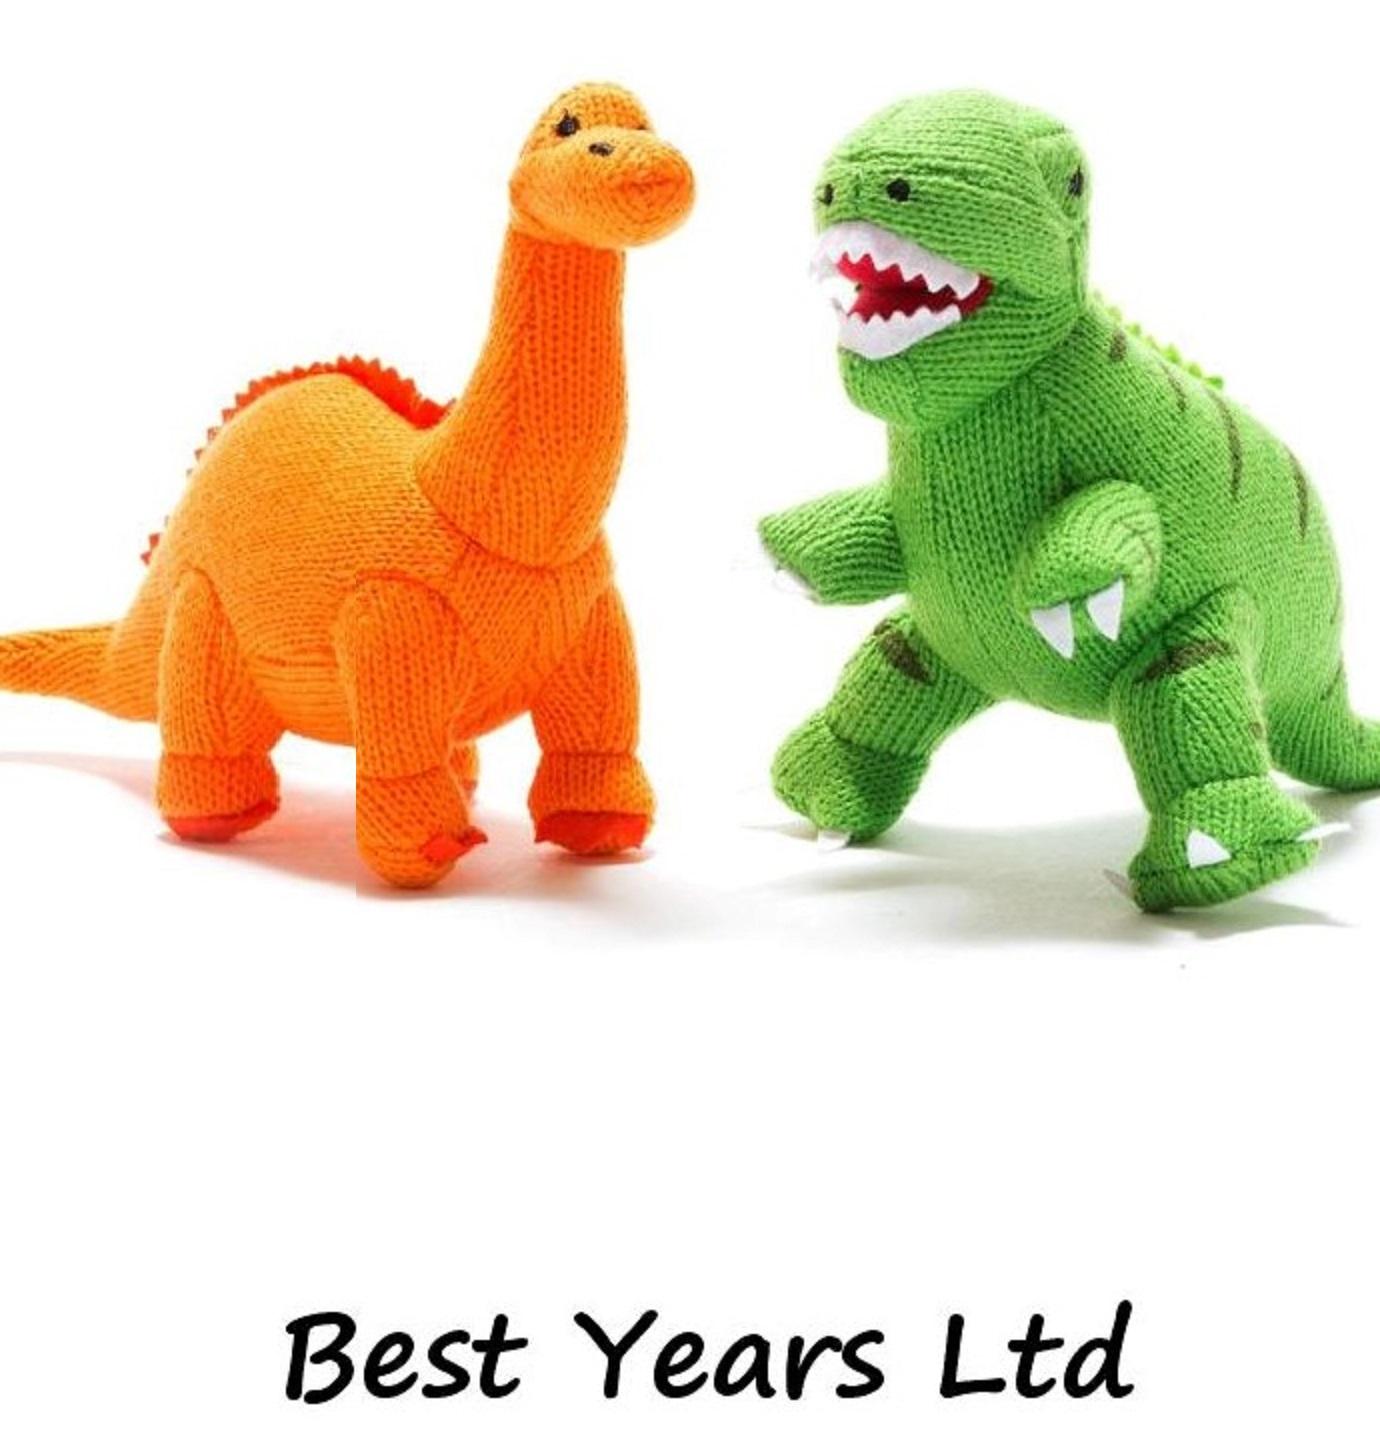 Best Years Ltd dino logo